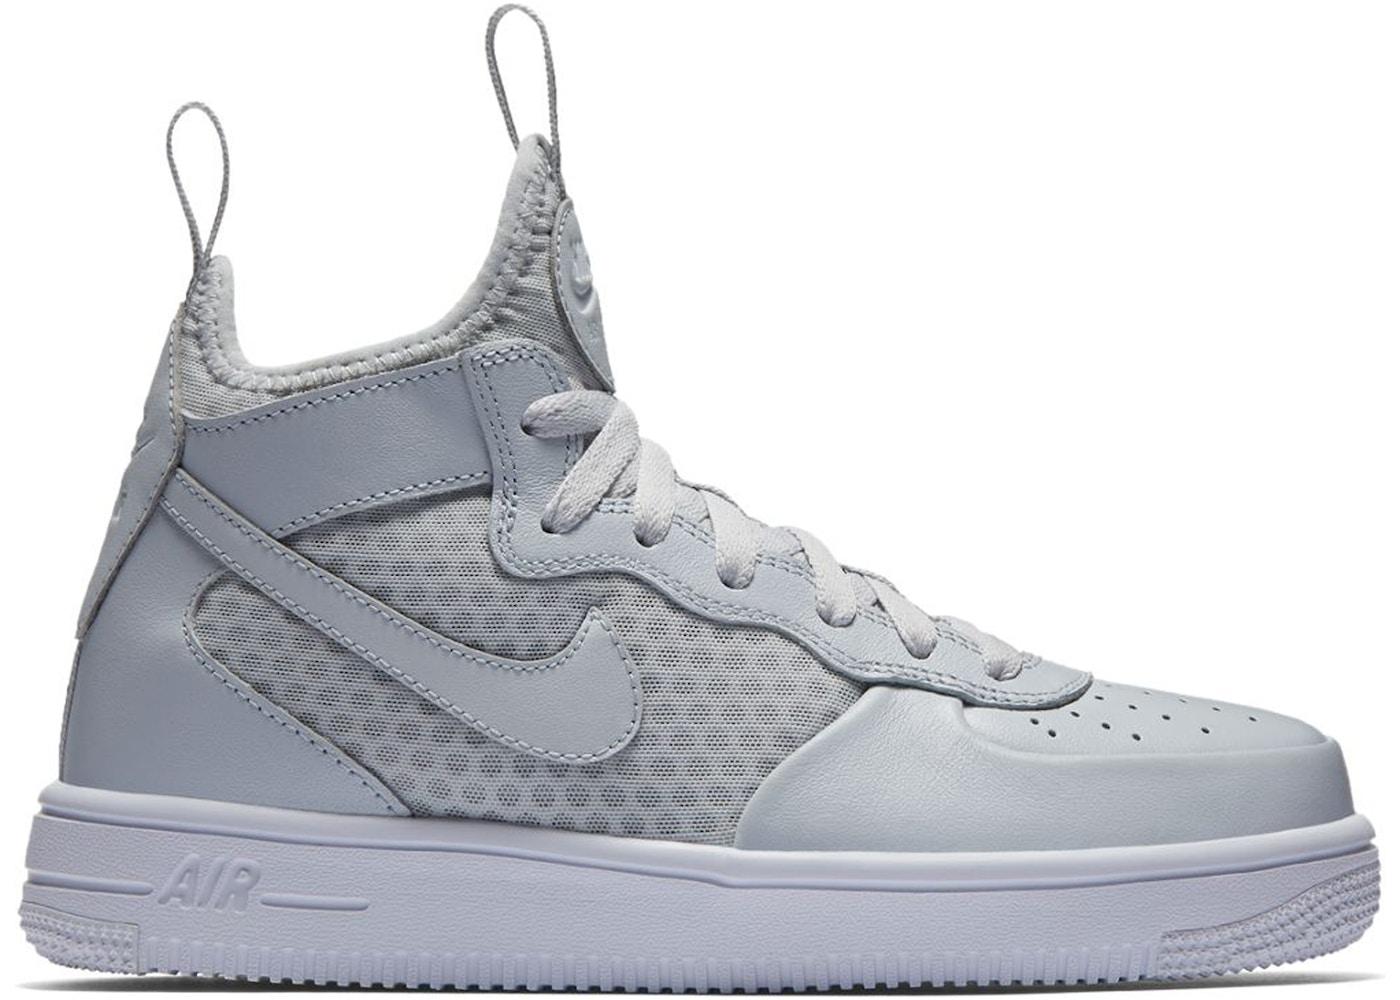 Nike Air Force 1 Ultraforce Mid Grey (GS) - 869945-002